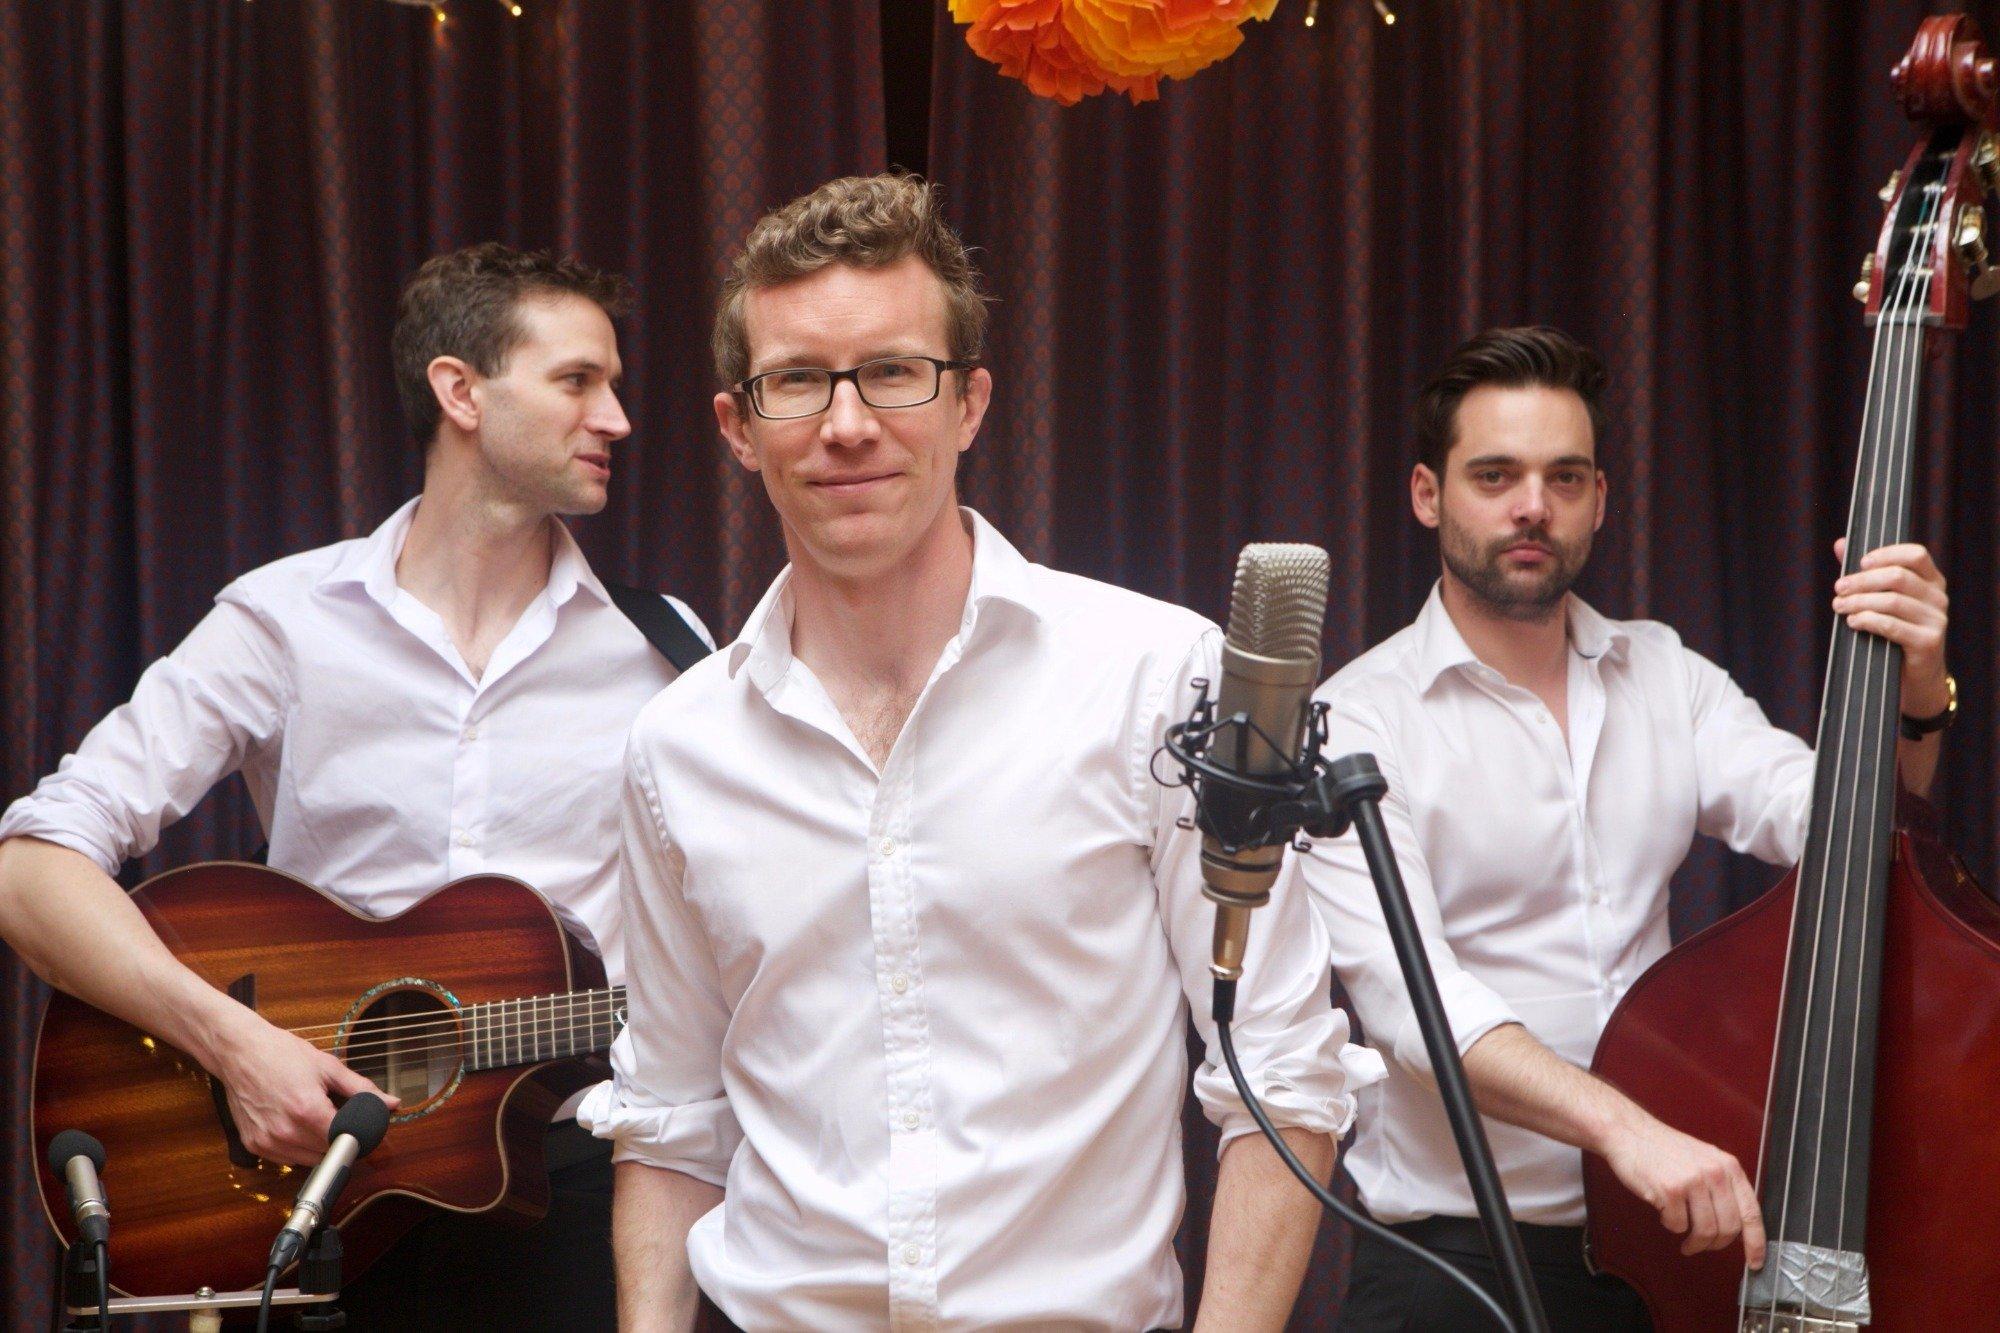 Promo Surround Sound Acoustic Trio Kent